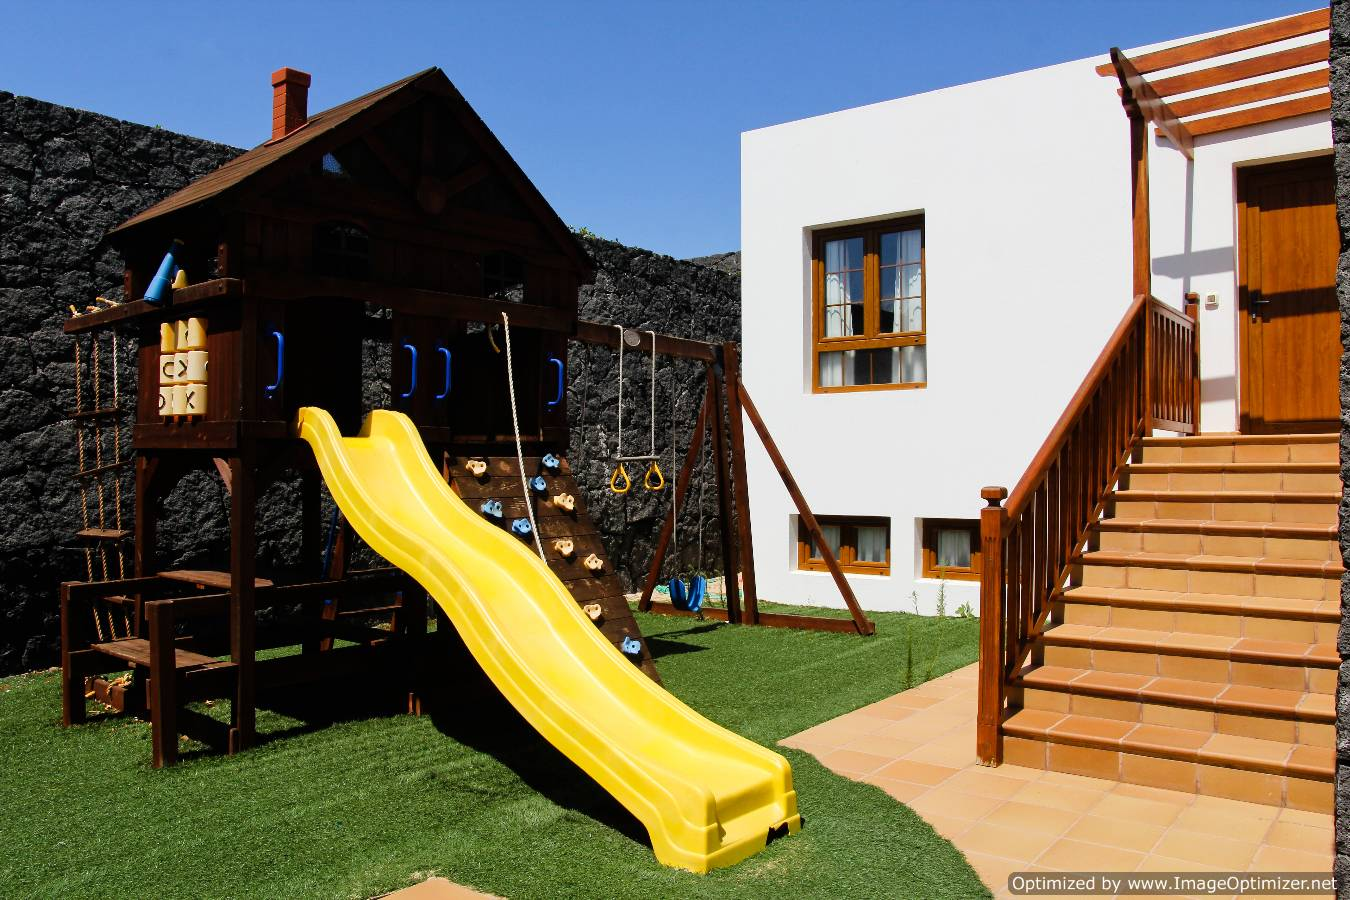 LVC261708 Childerns Play area